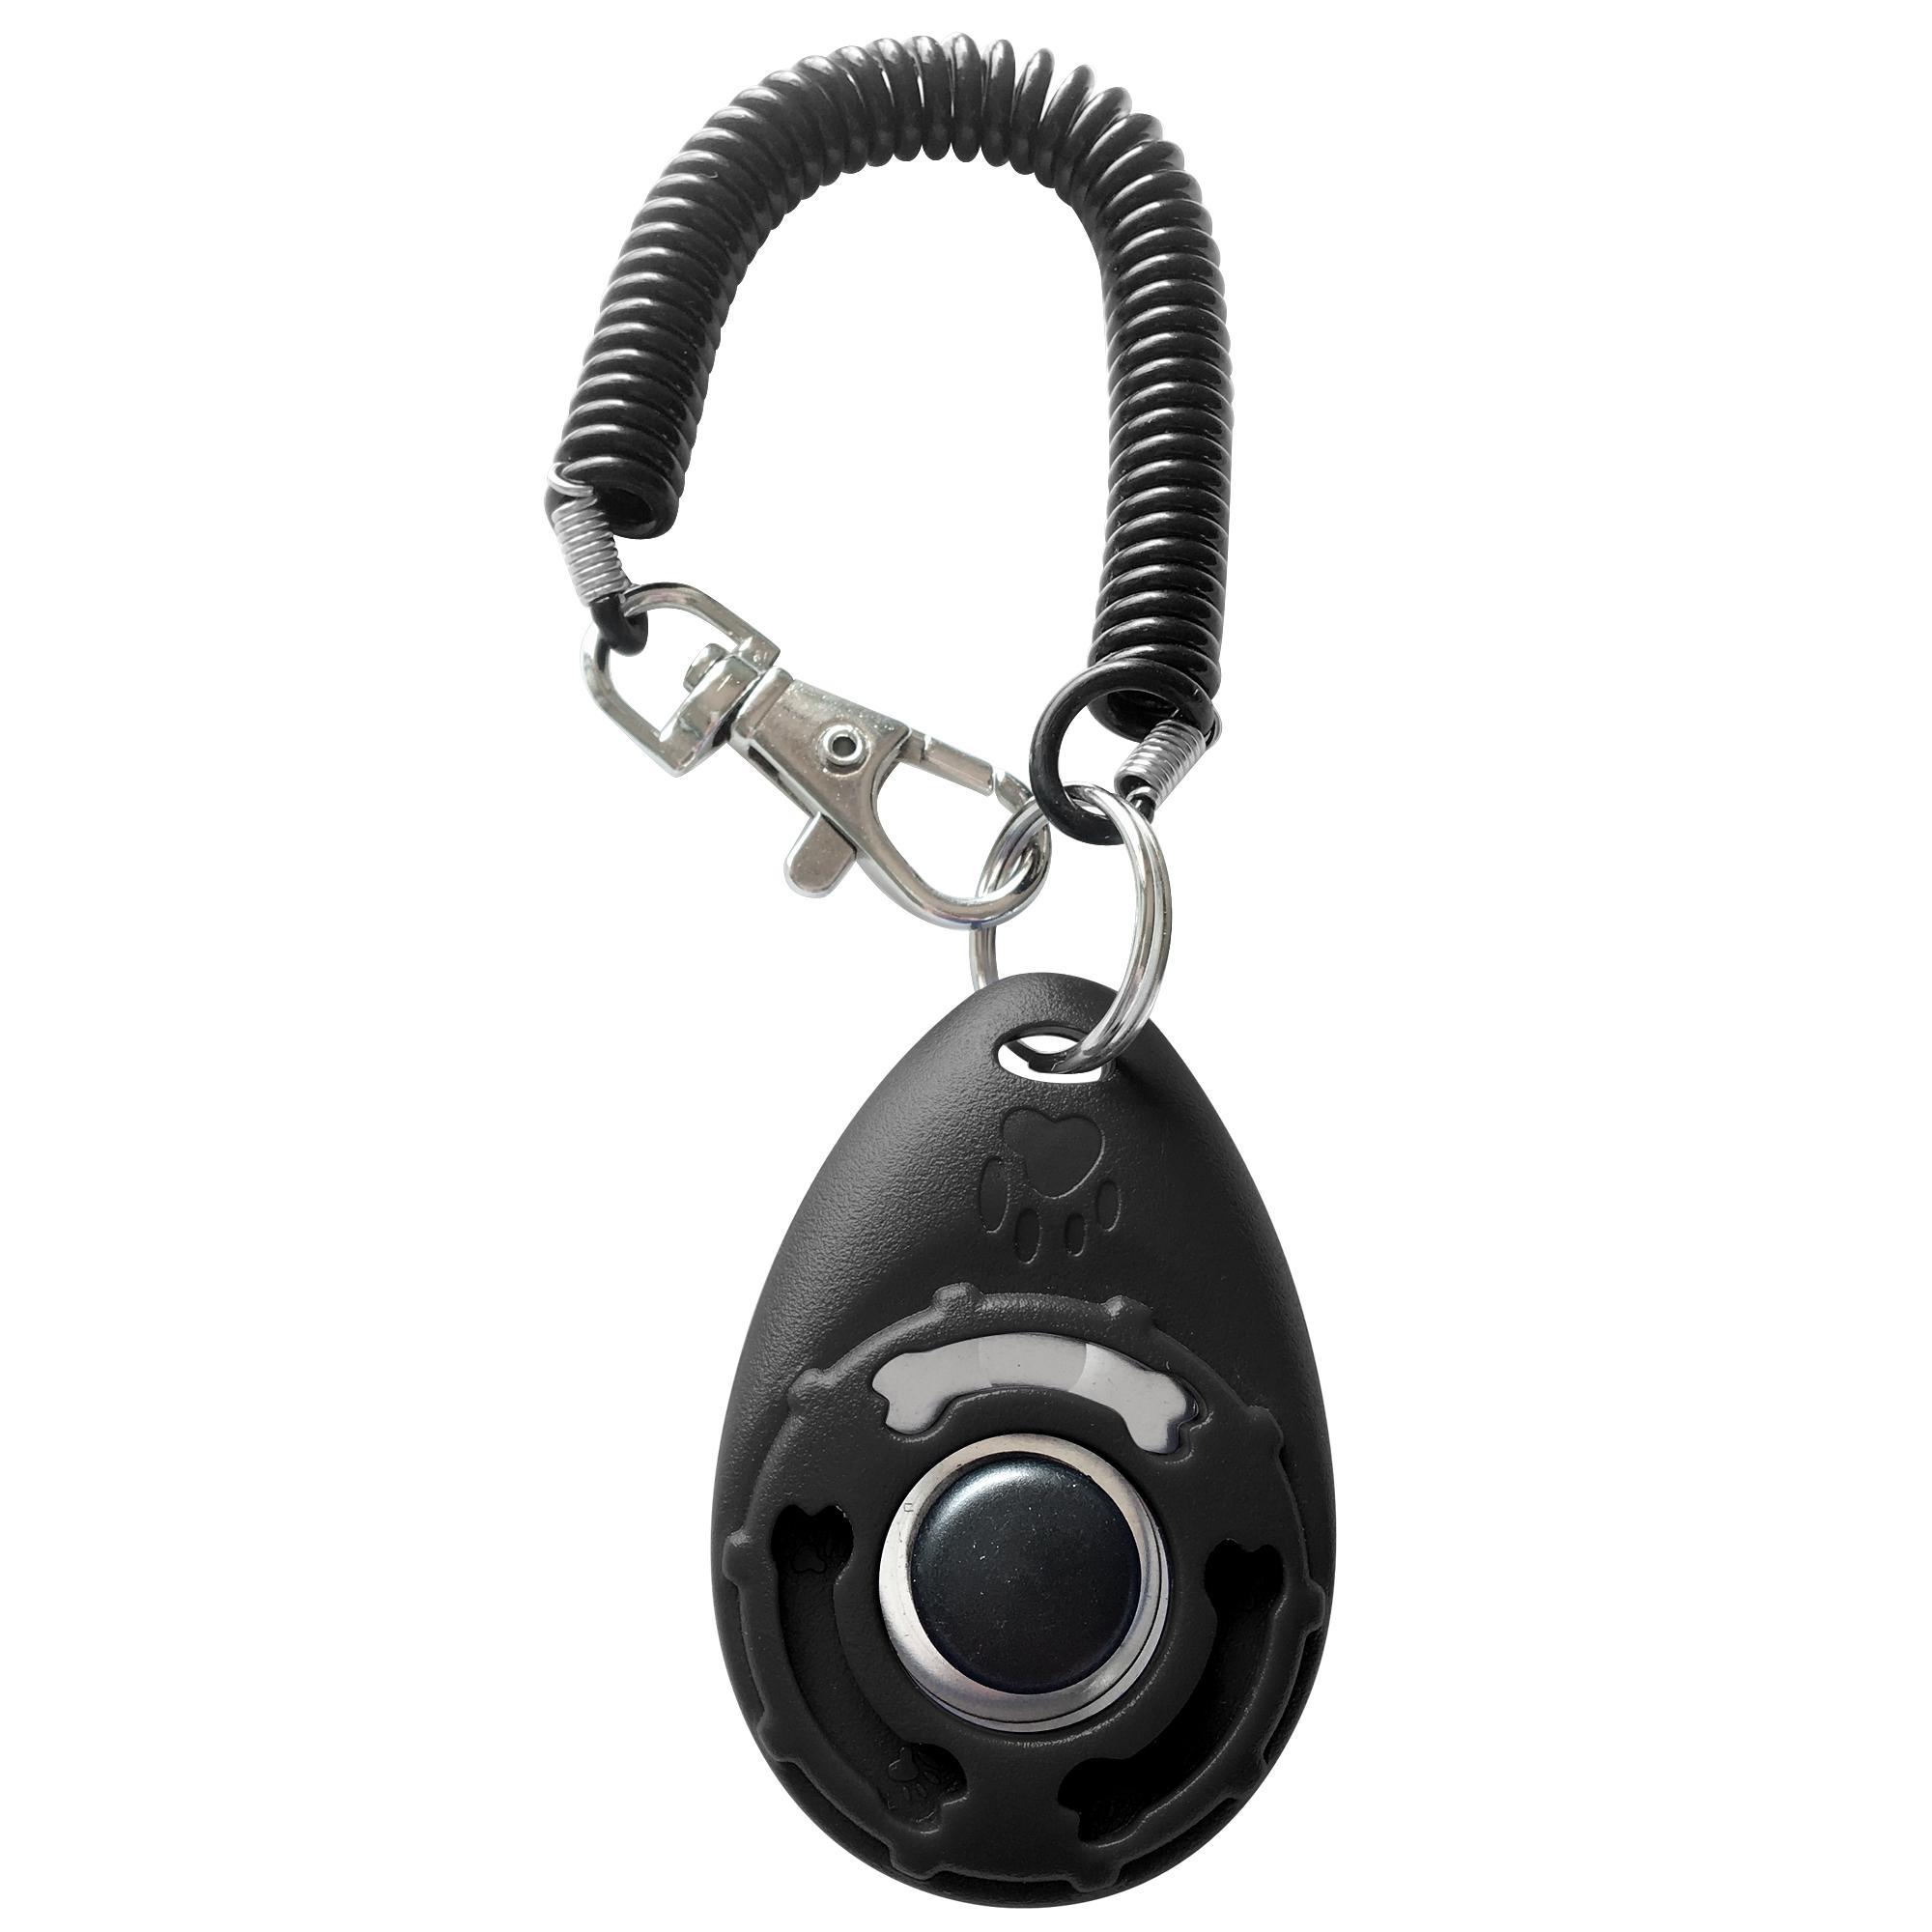 Posdou Pet Training Clicker with Wrist Strap - Dog Training Clicker - intl